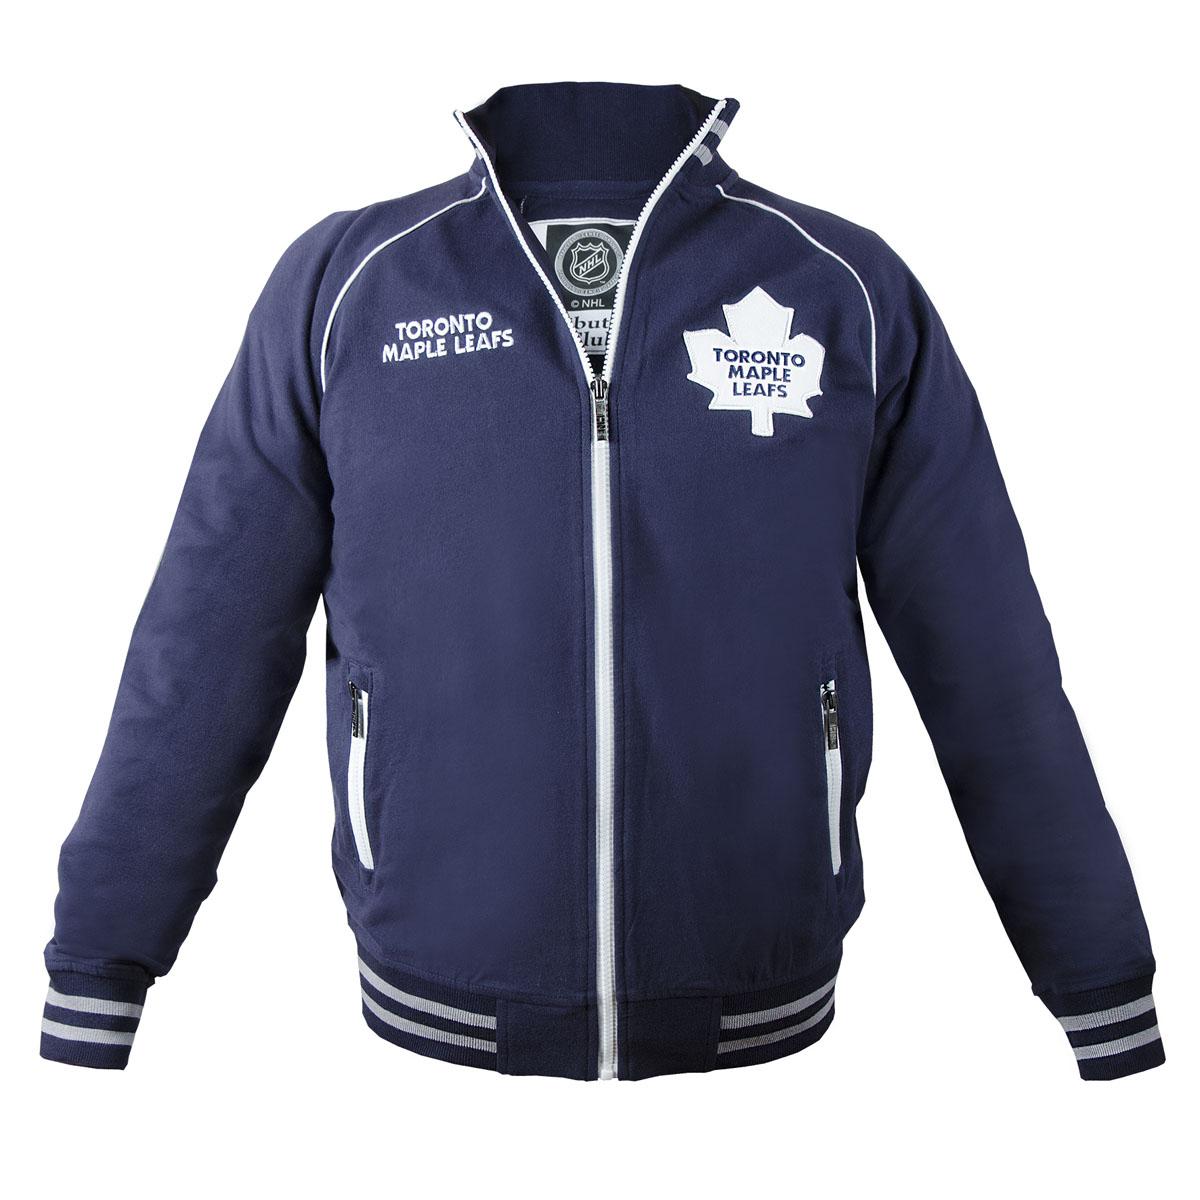 Толстовка мужская NHL Toronto Maple Leafs, цвет: темно-синий. 35580. Размер XS (44)